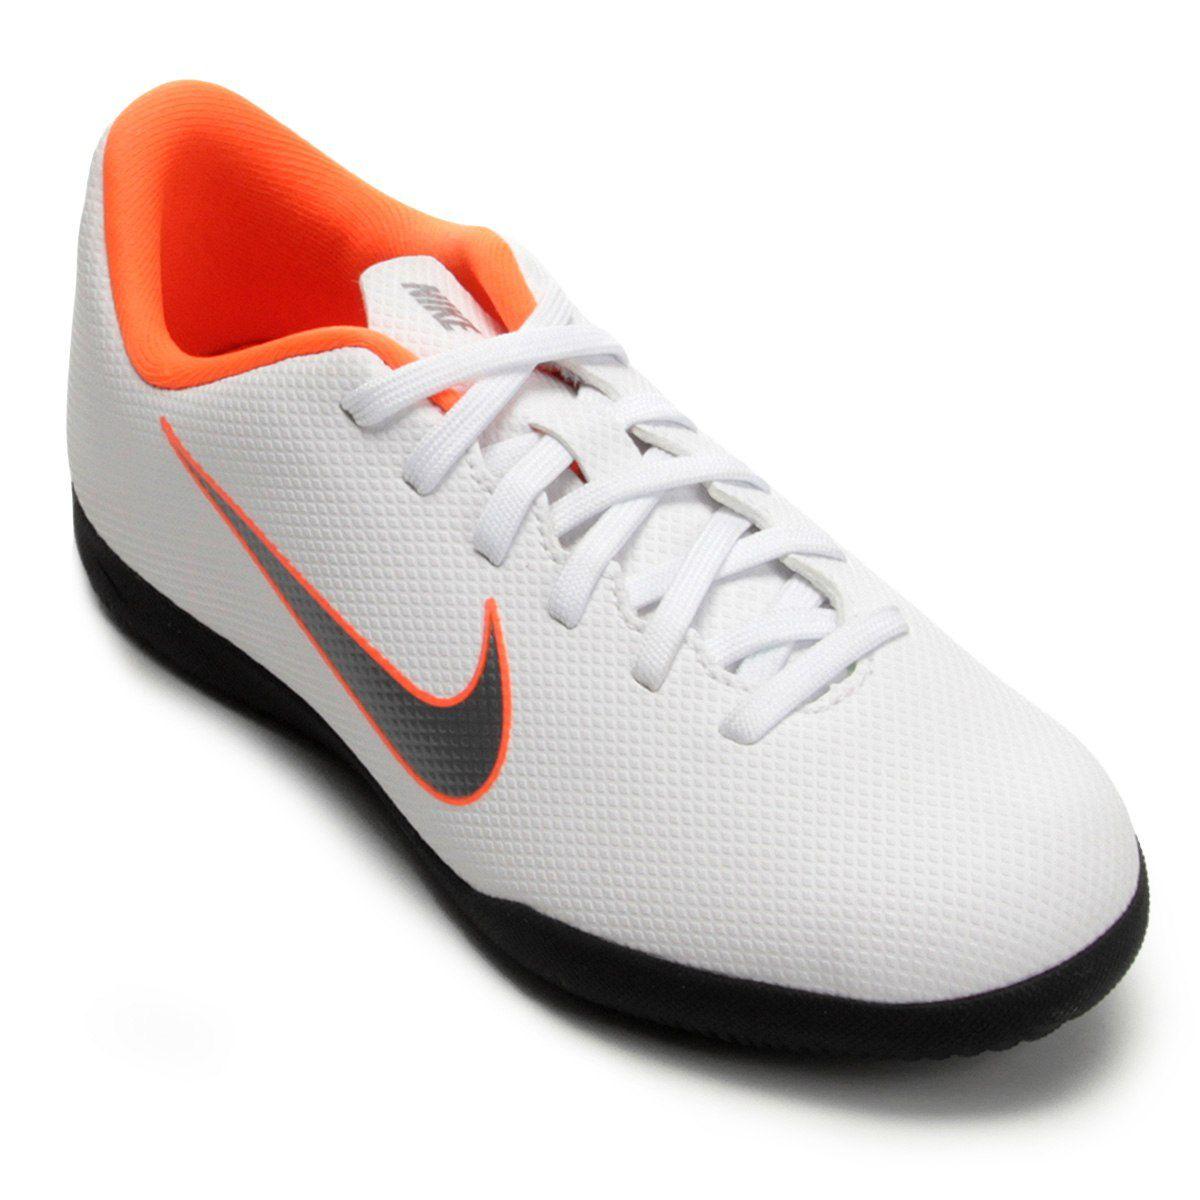 9b8bd3174a Chuteira Futsal Nike Mercurial Vaporx 12 Club - Titanes Esportes